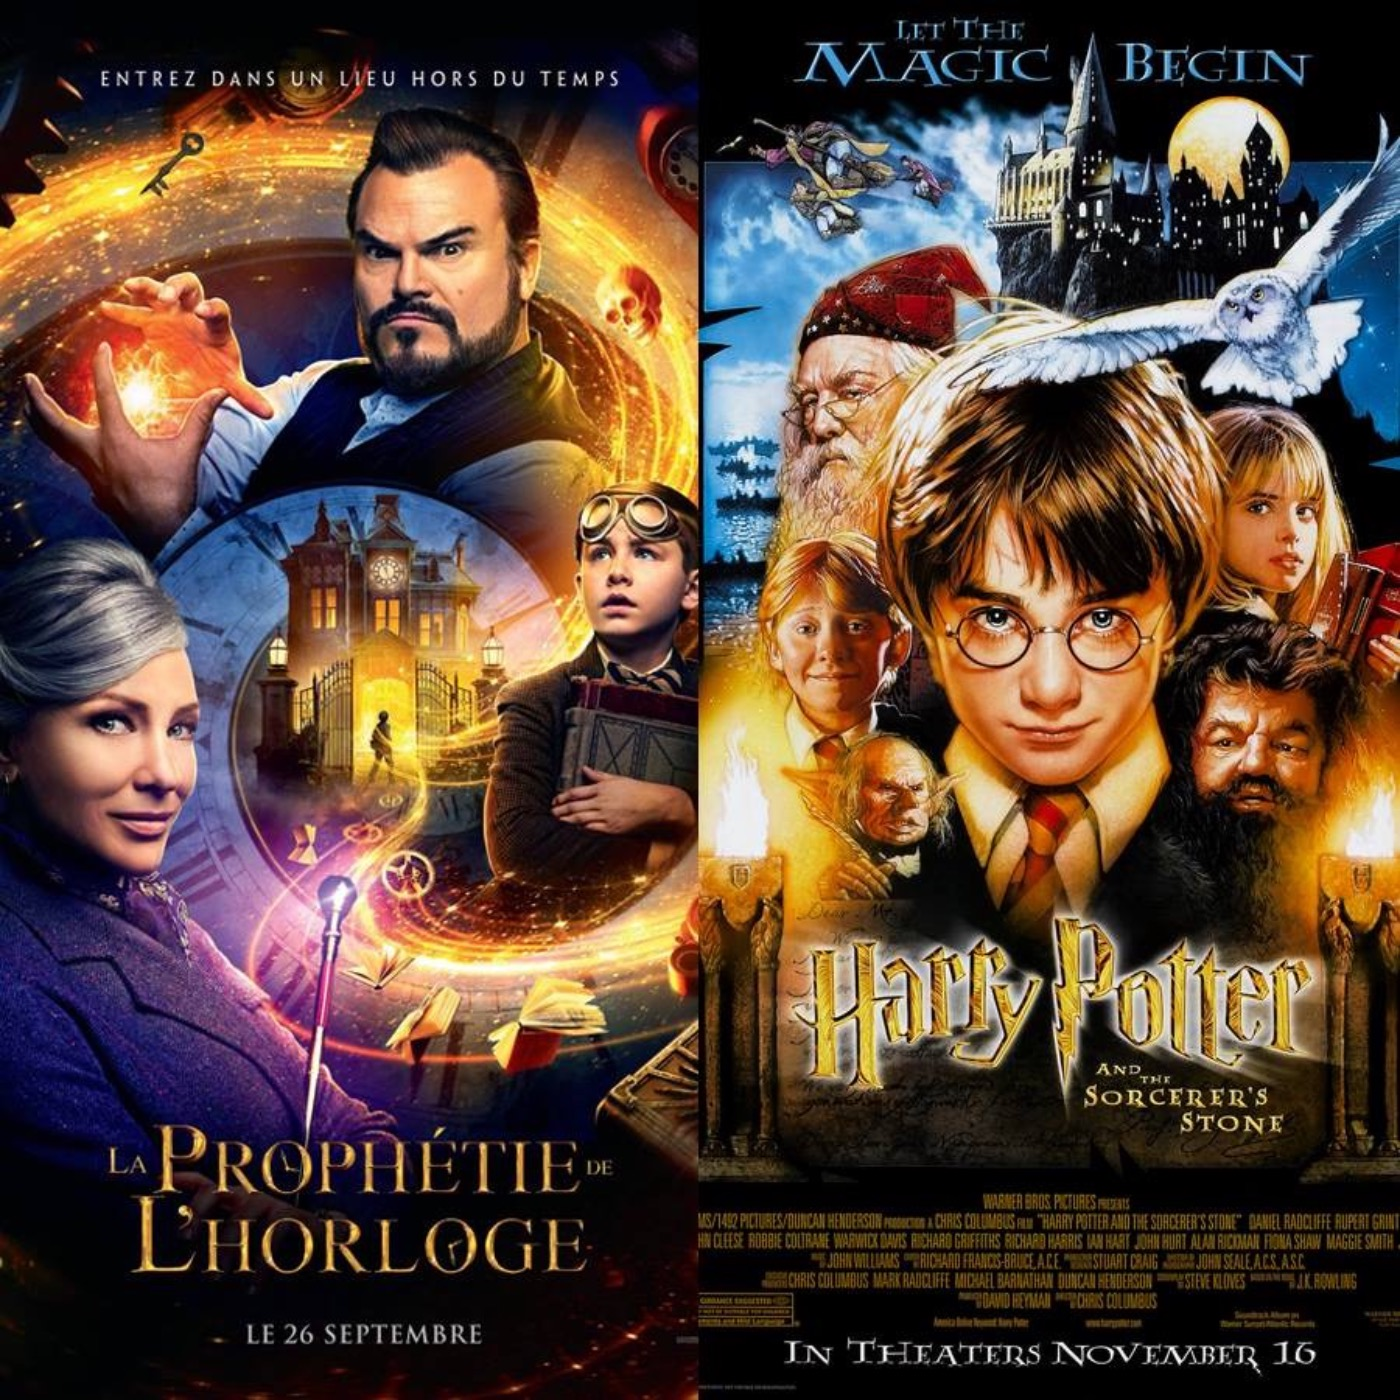 #17 LA PROPHÉTIE DE L'HORLOGE et HARRY POTTER : Magic System